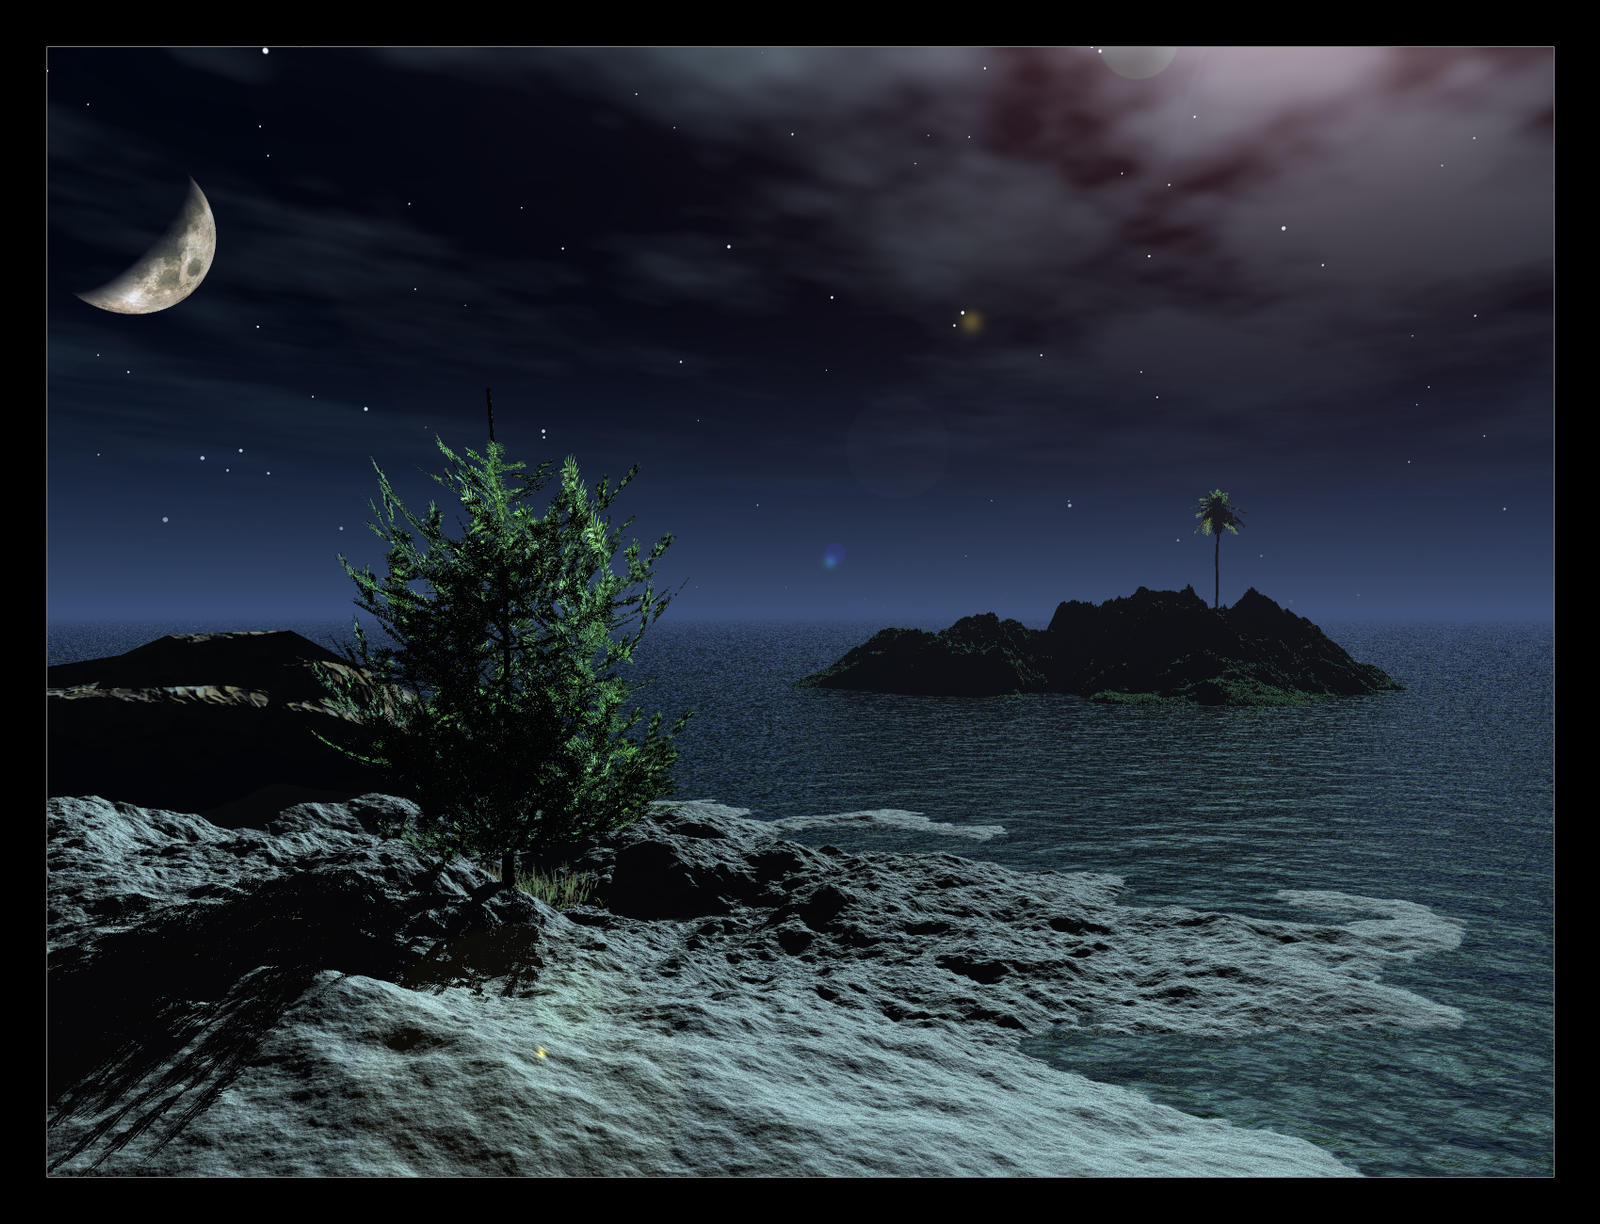 http://img08.deviantart.net/983e/i/2008/015/2/4/nature__s_goodnight_by_aphotik.jpg